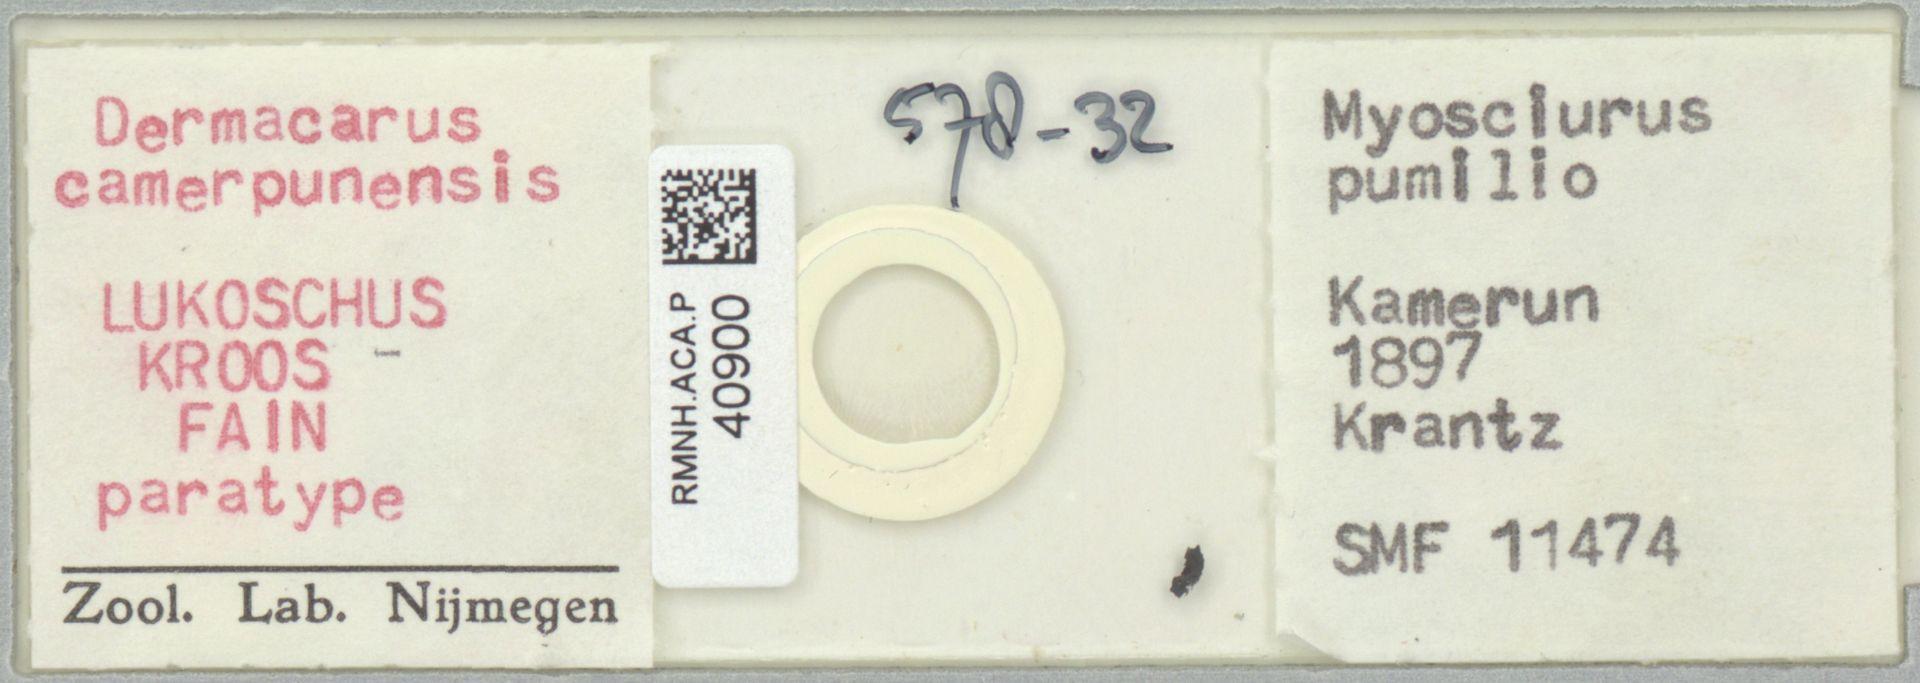 RMNH.ACA.P.40900   Dermacarus camerpunensis LUKOSCHUS KROOS FAIN